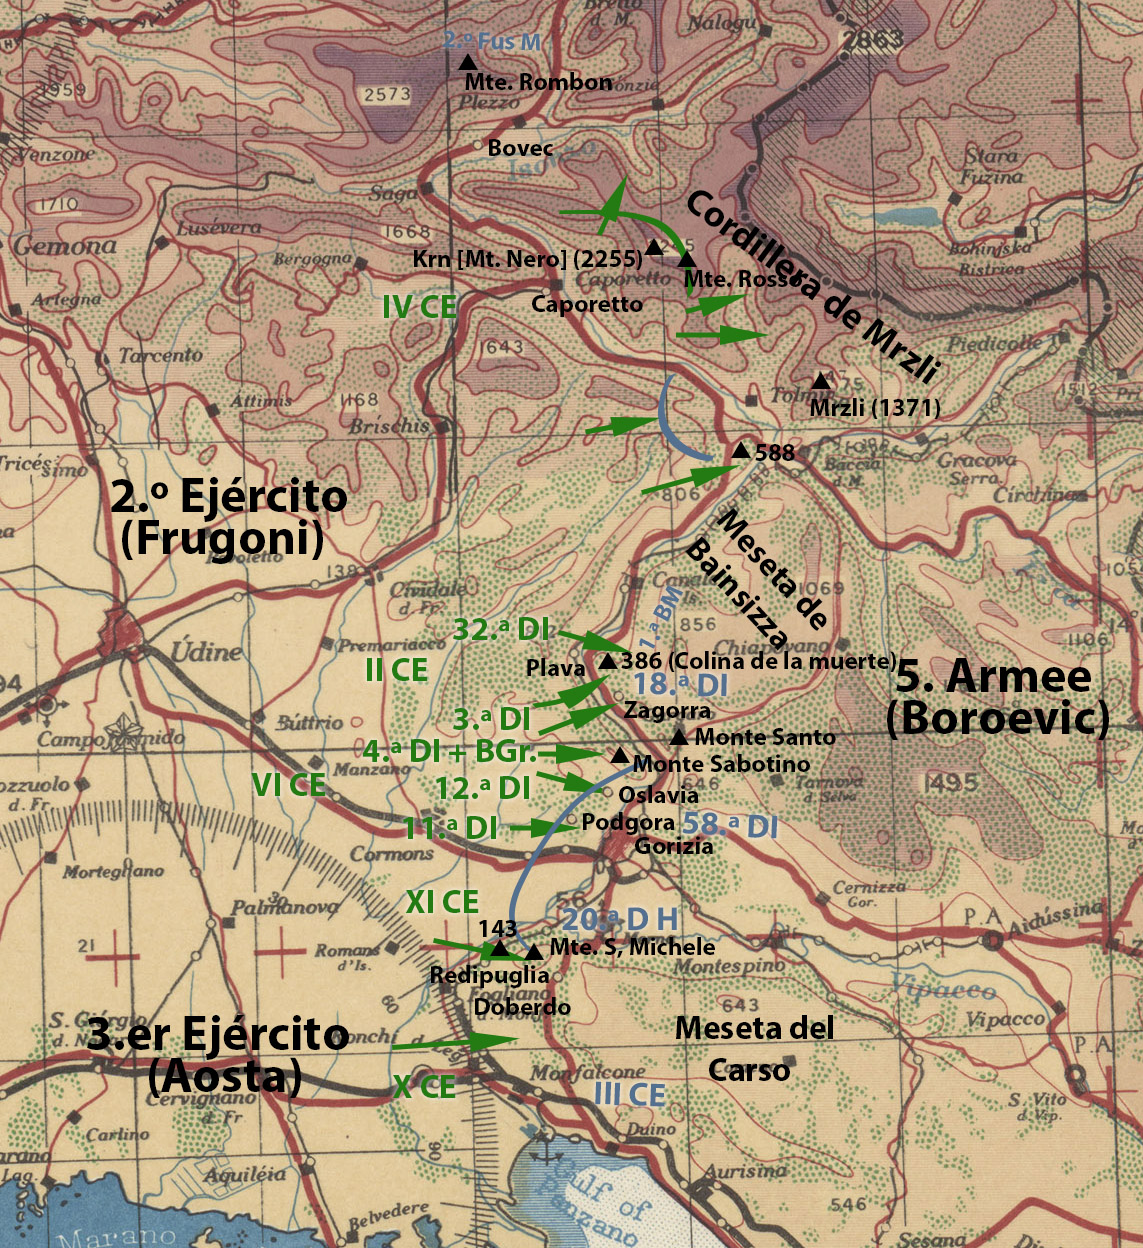 mapa-3-a-batalla